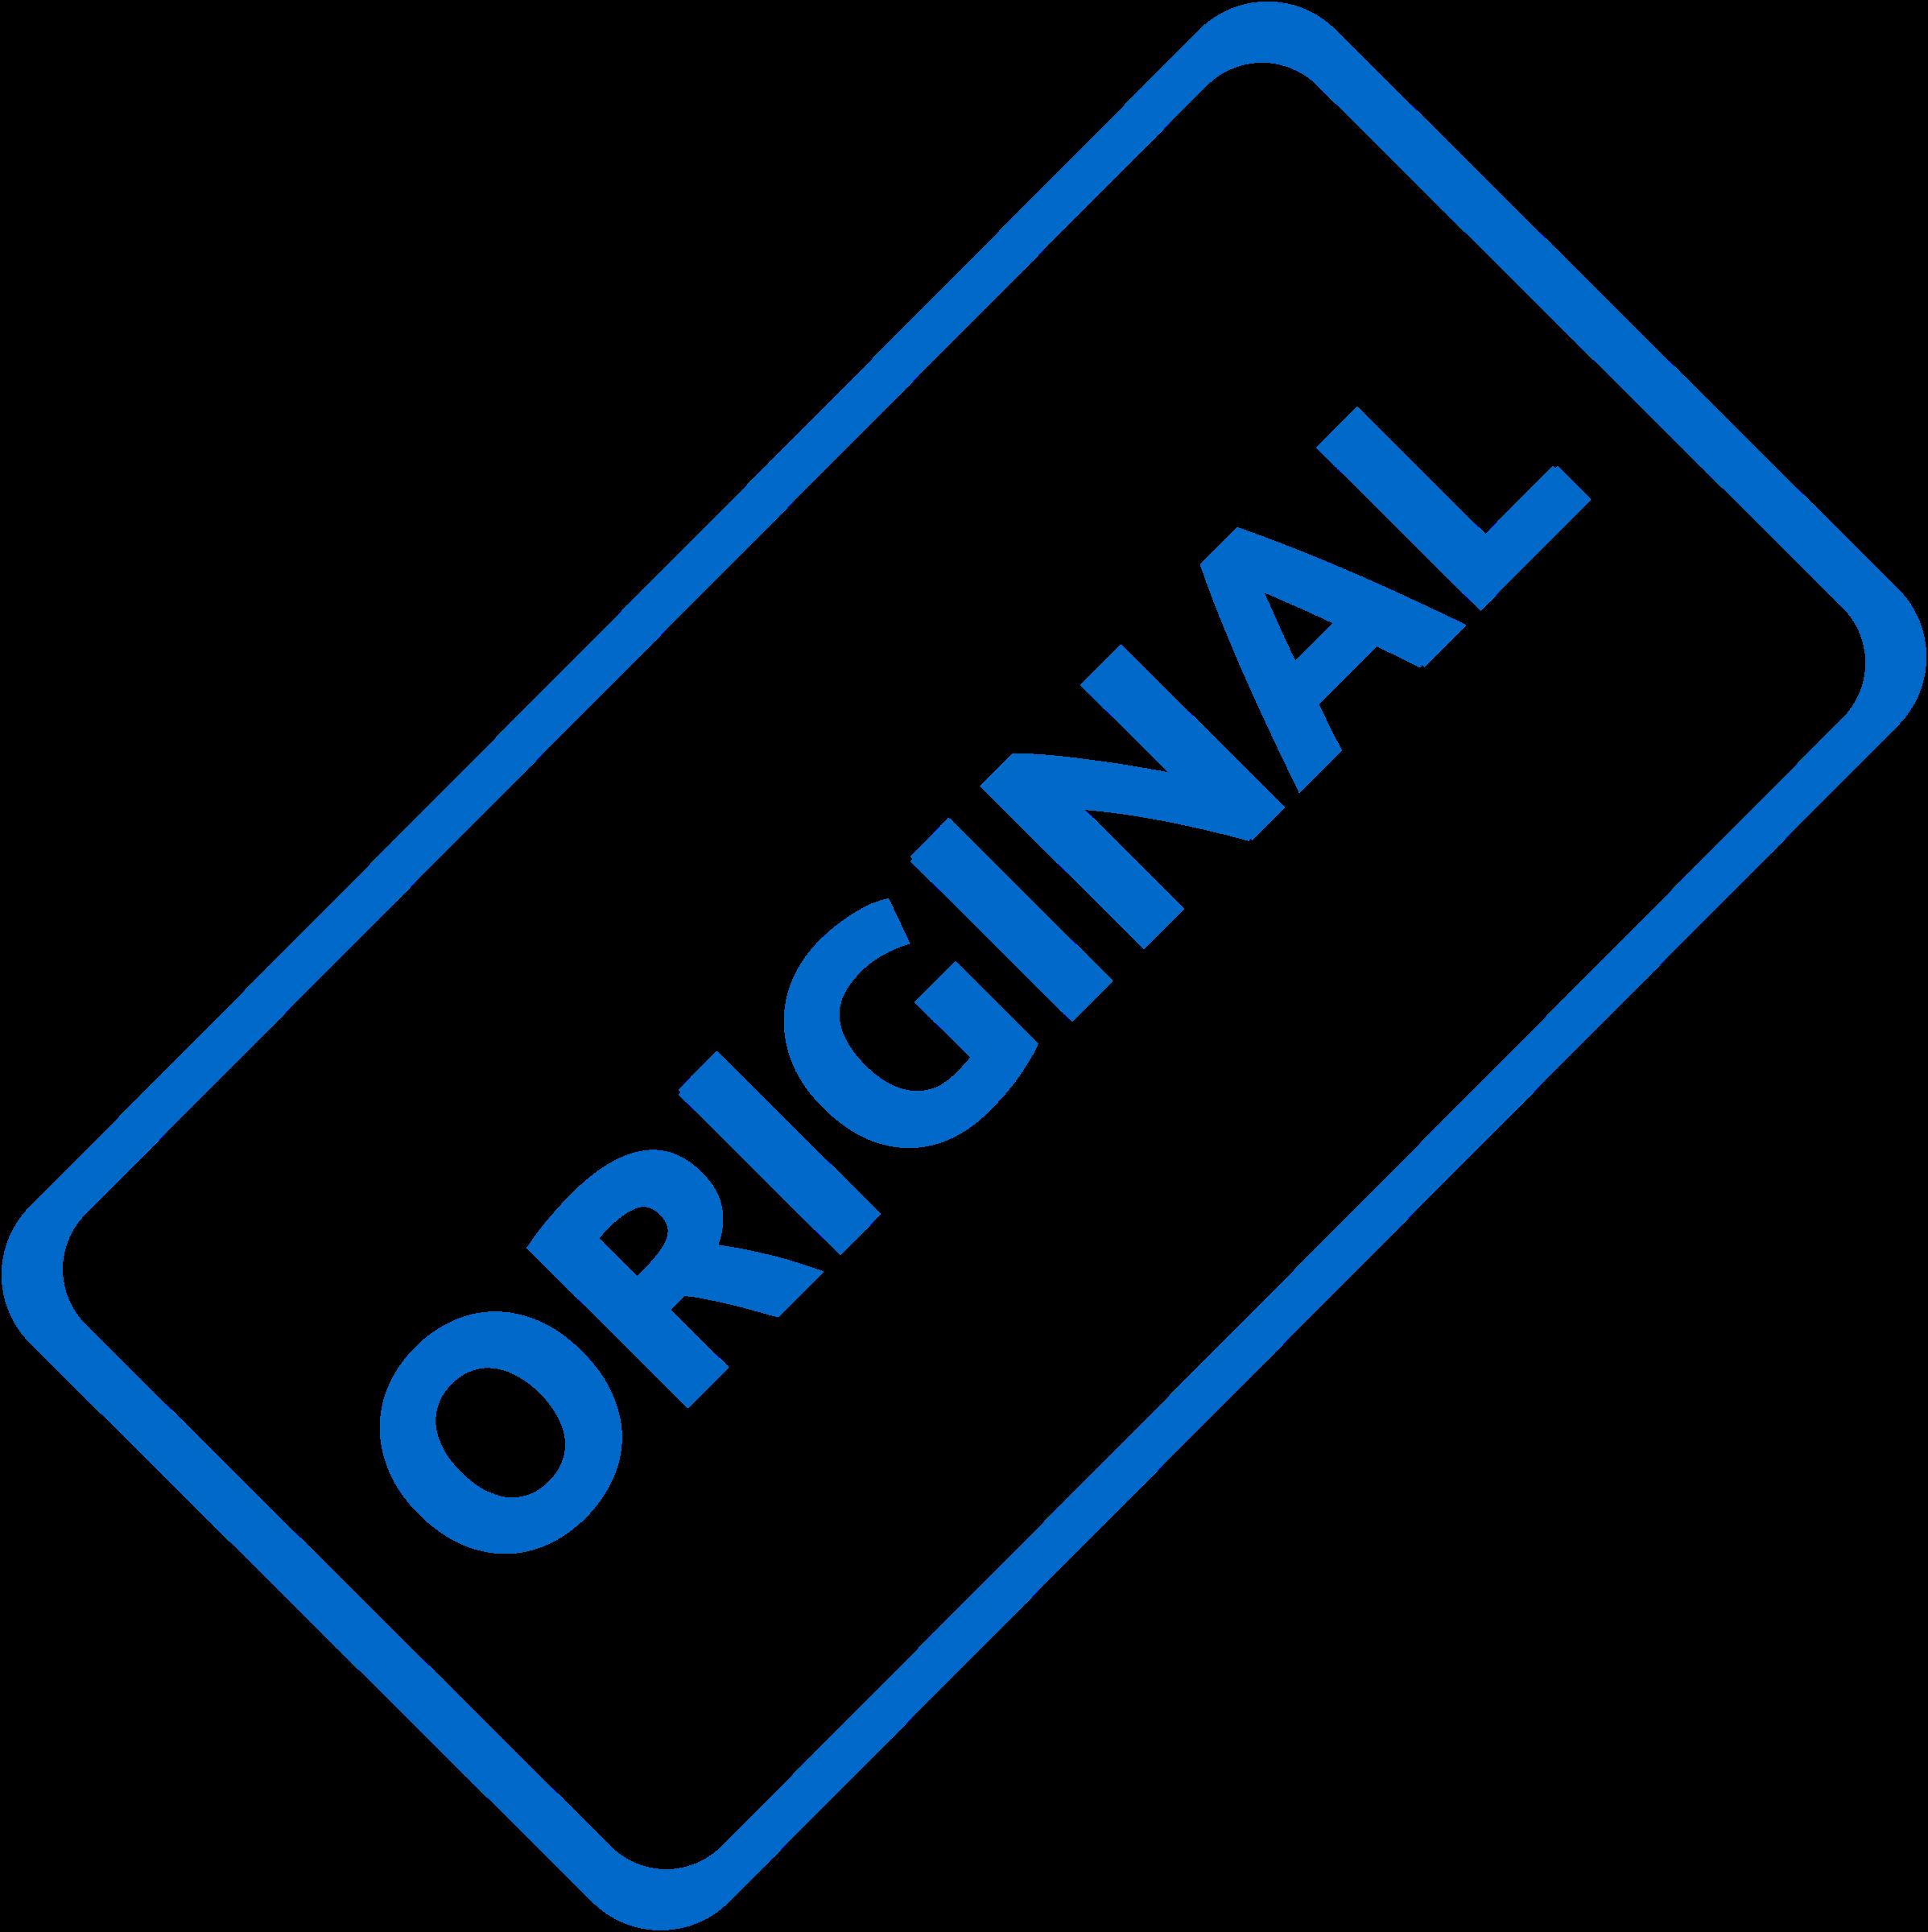 svg free Business big image png. Stamp clipart original